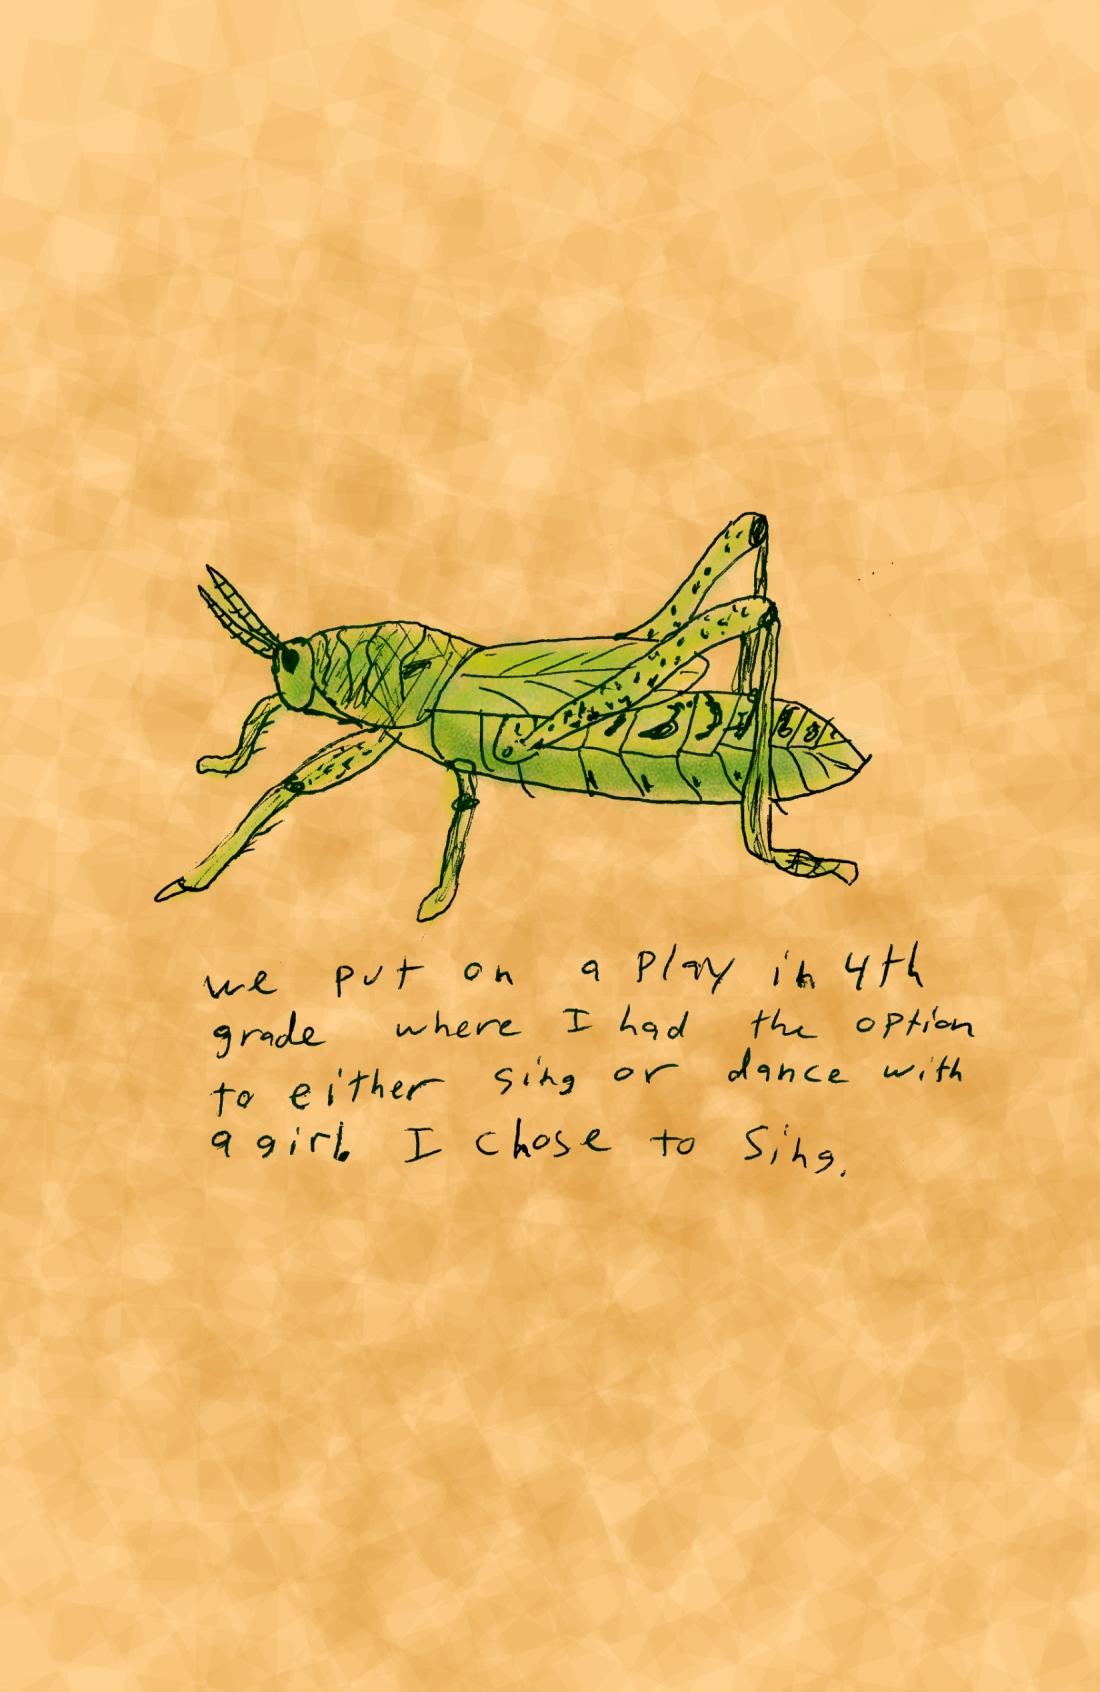 bugs pg 18 c